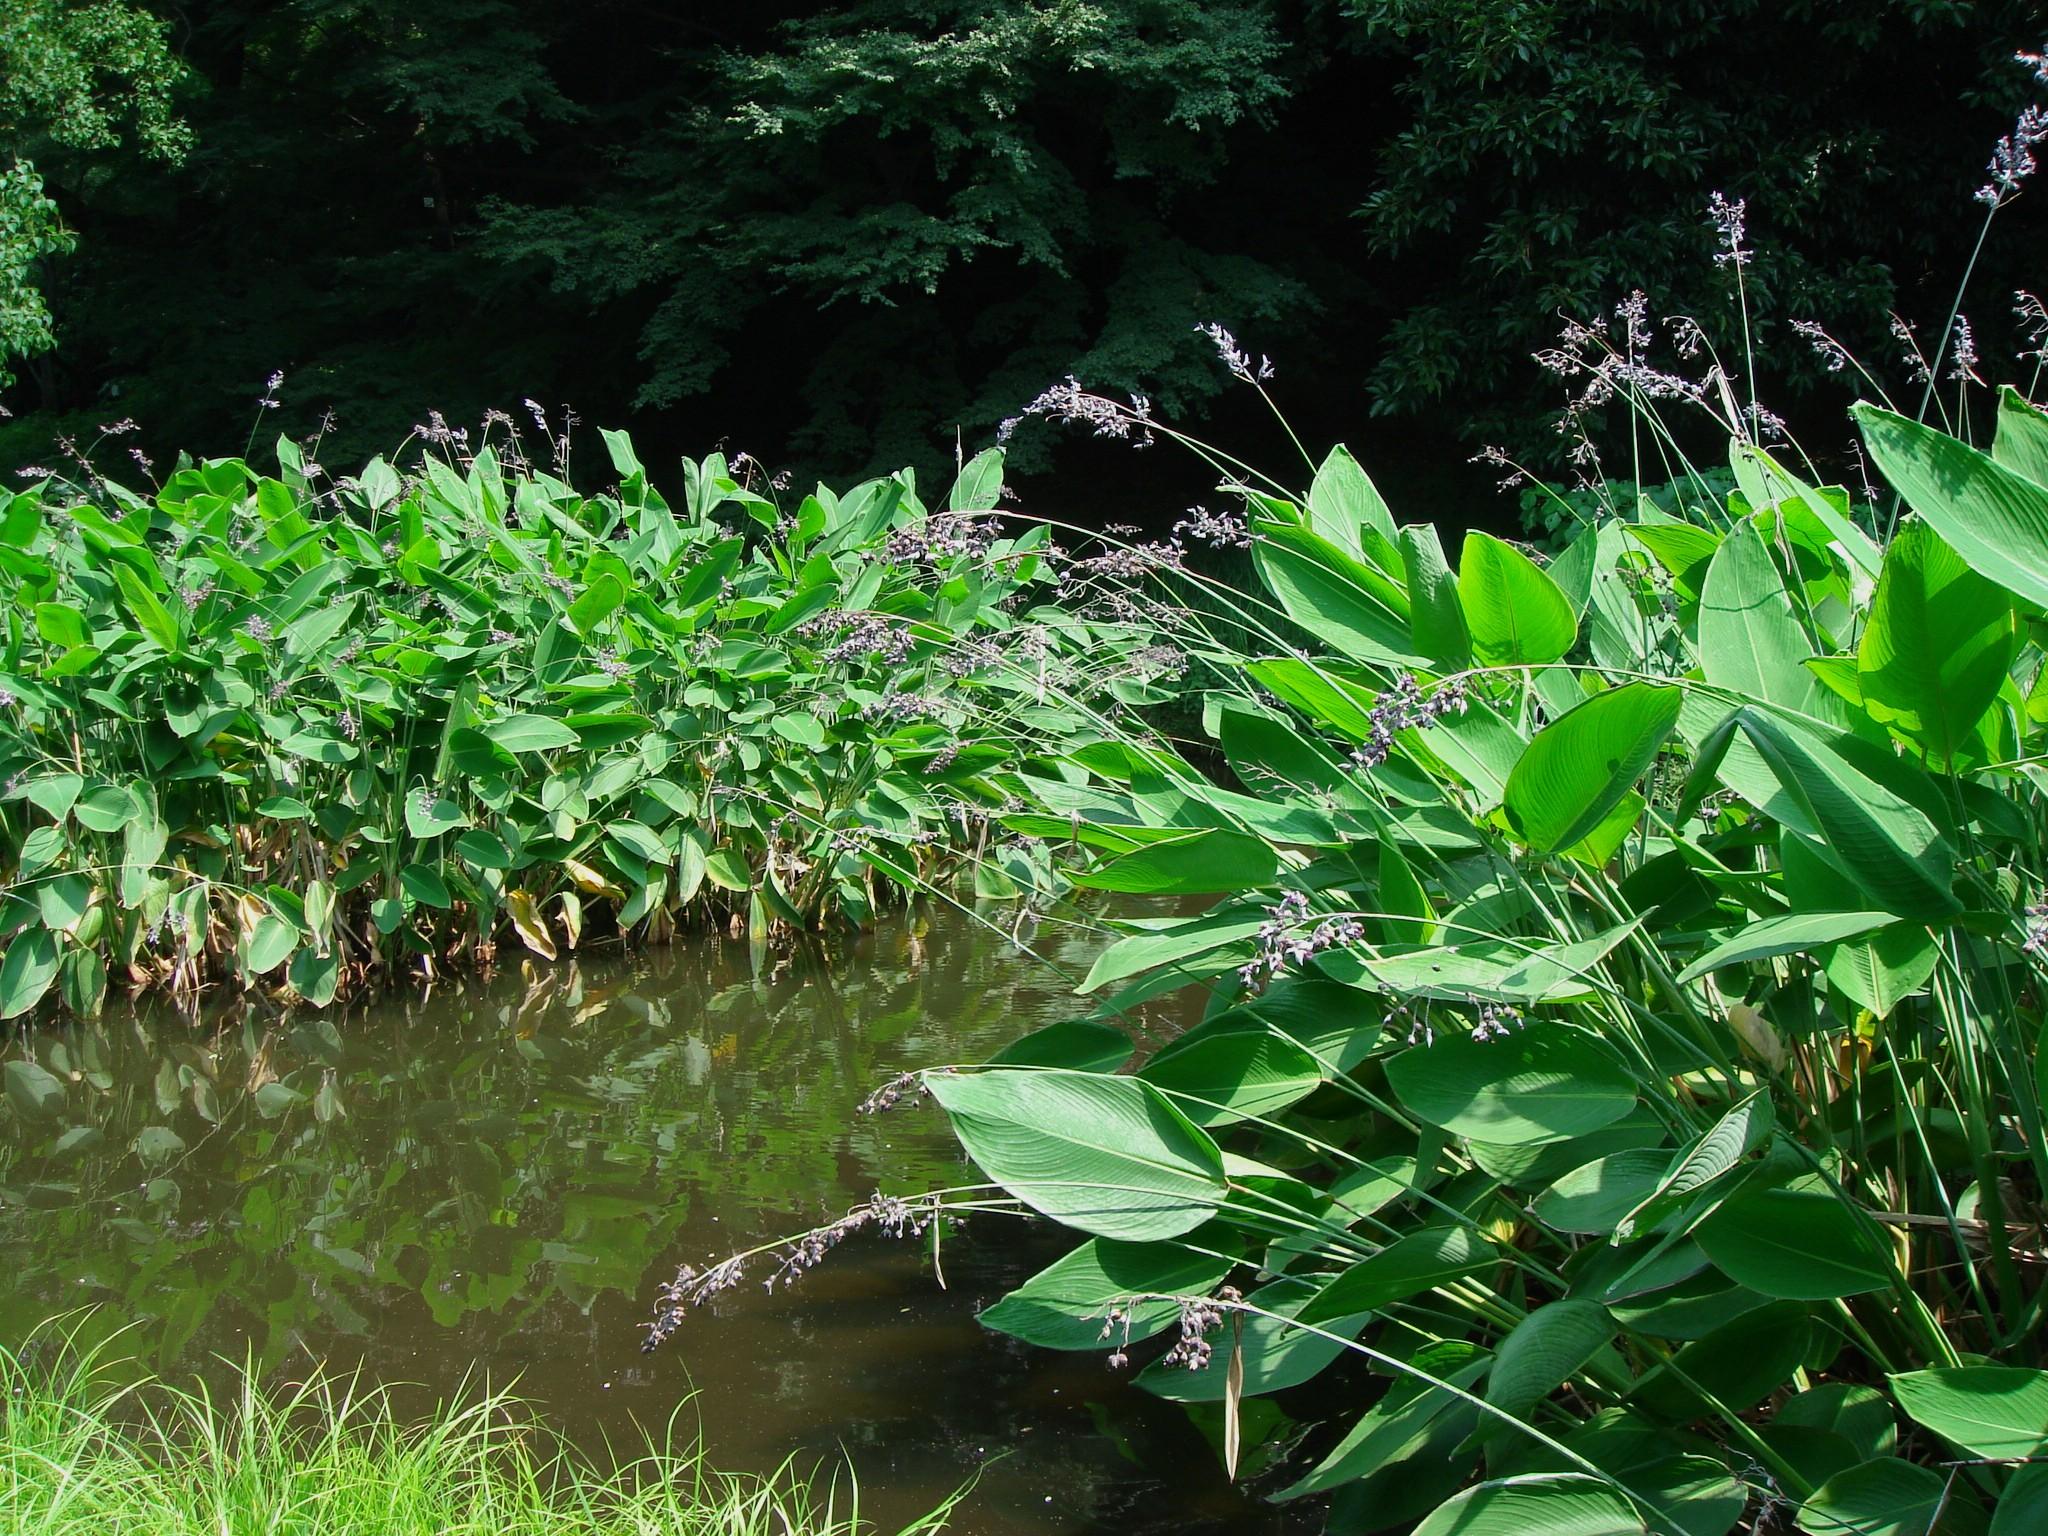 Thalia dealbata fraser ex roscoe for Plantas para estanques de peces